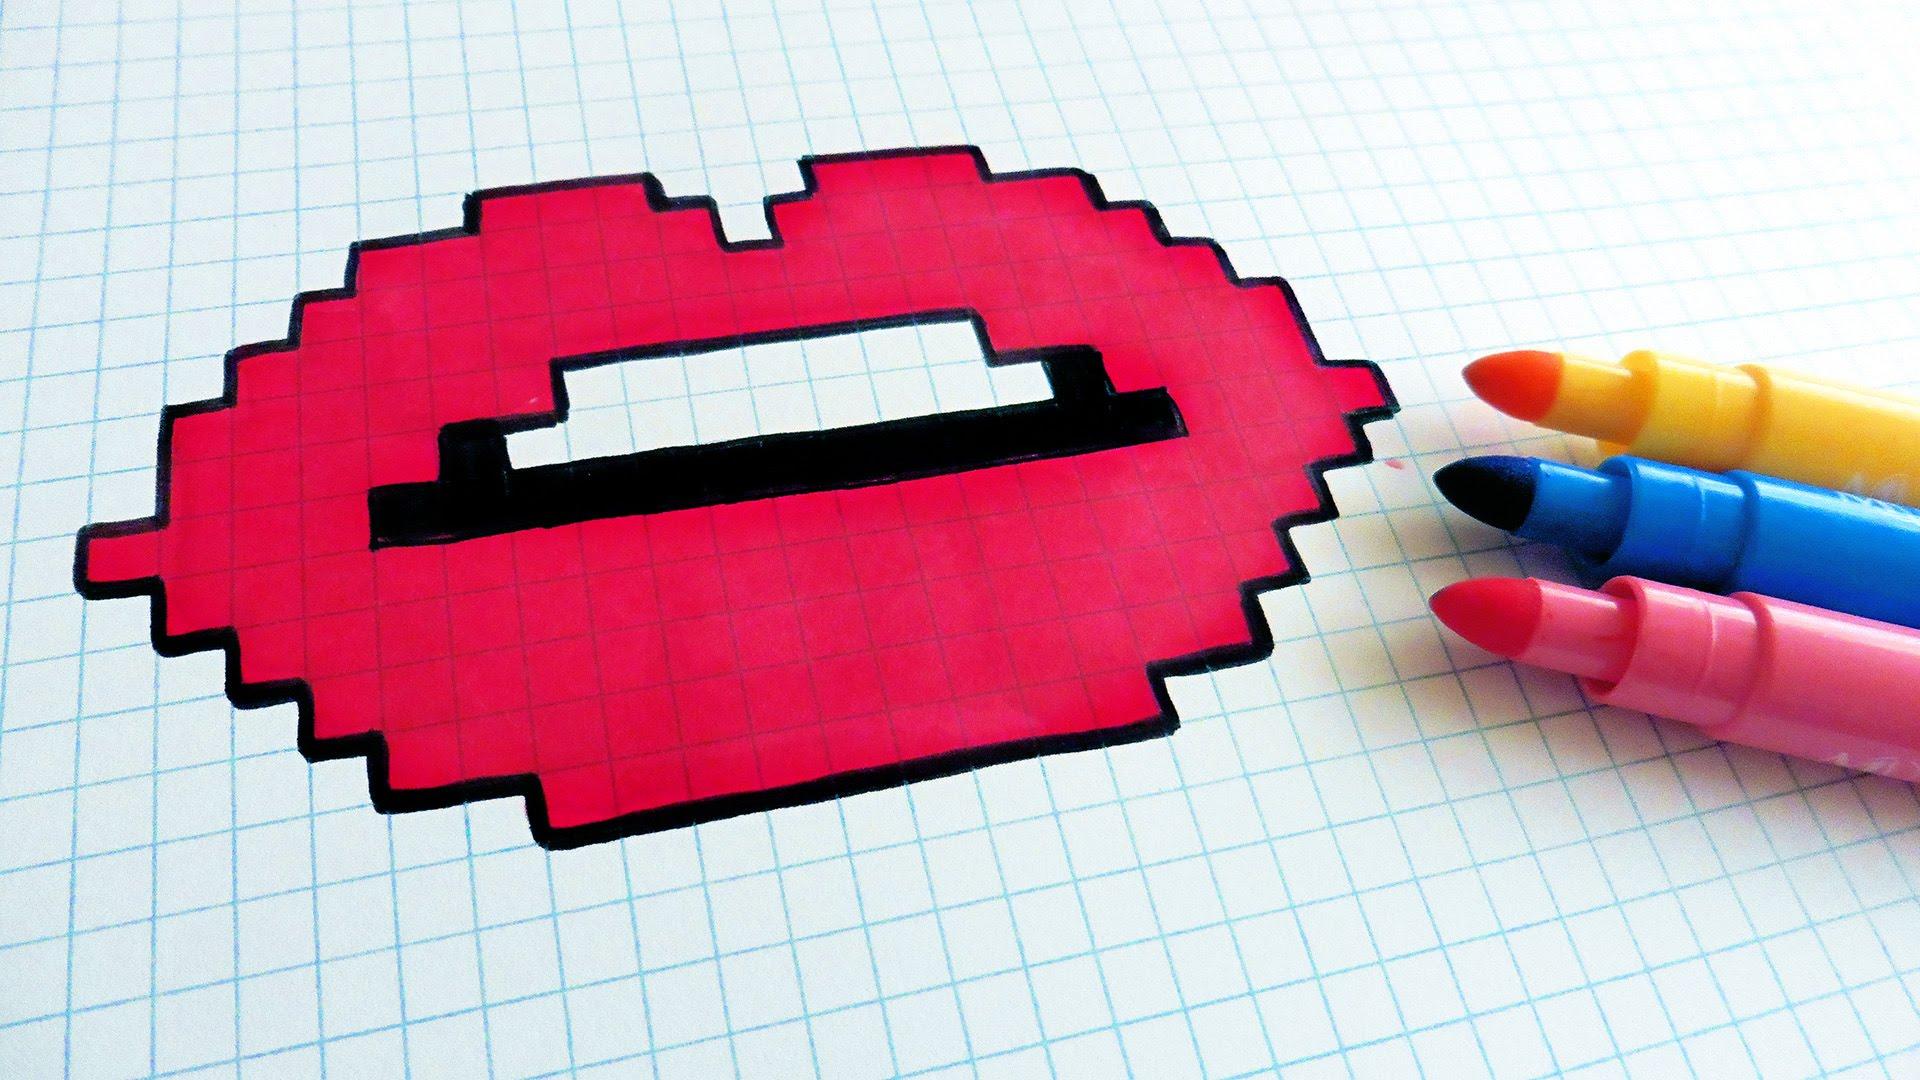 Drawn pixel art poop YouTube Lips Handmade Lips Pixel